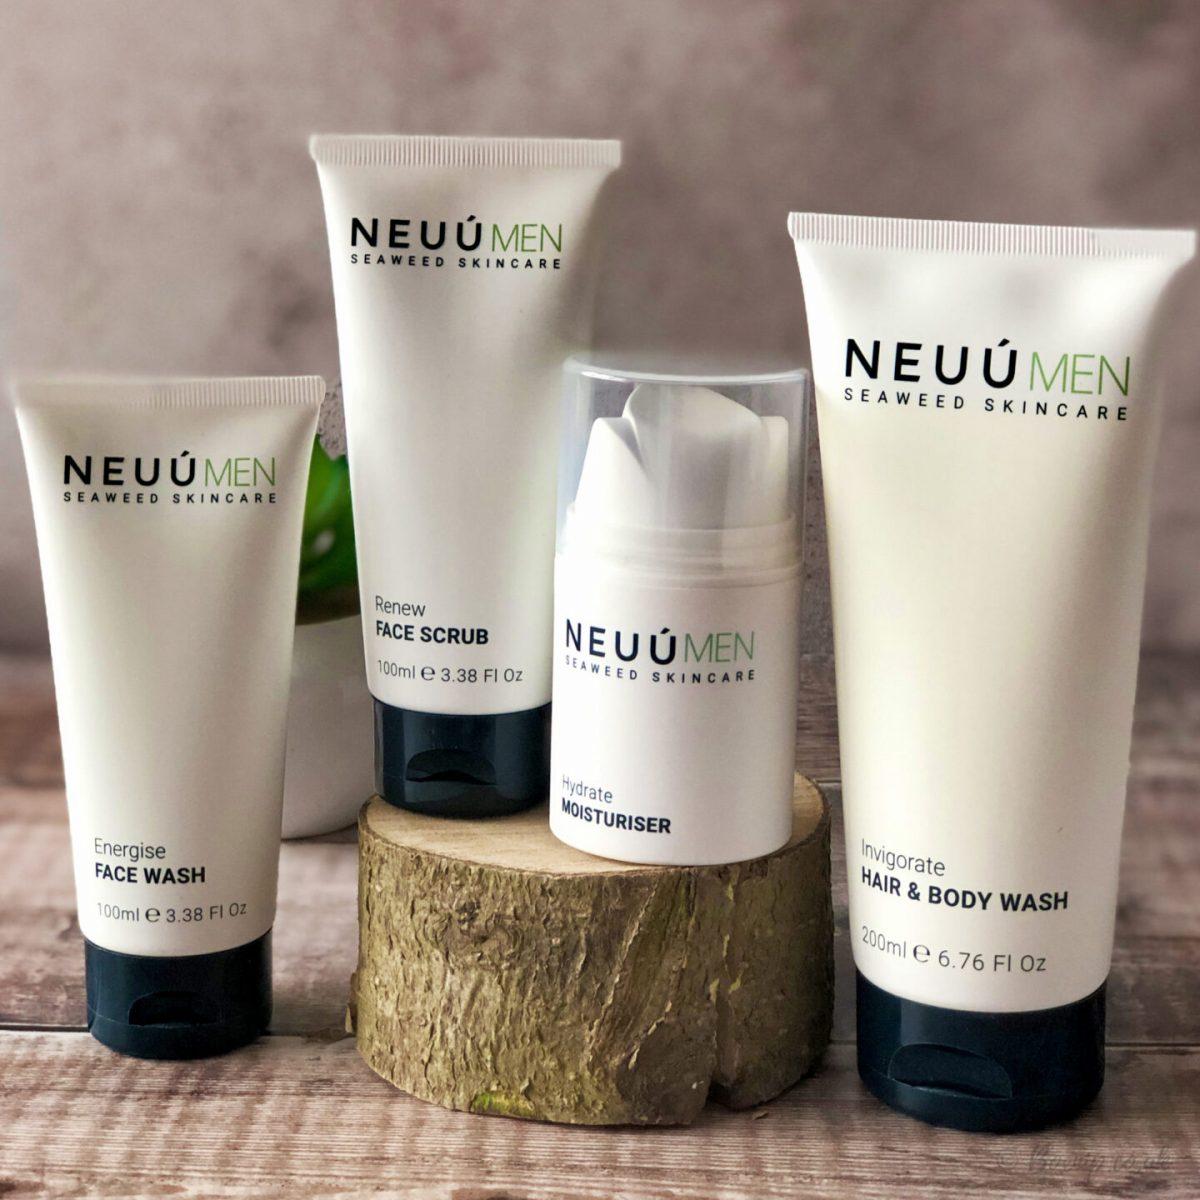 NEUÚ Seaweed Skincare